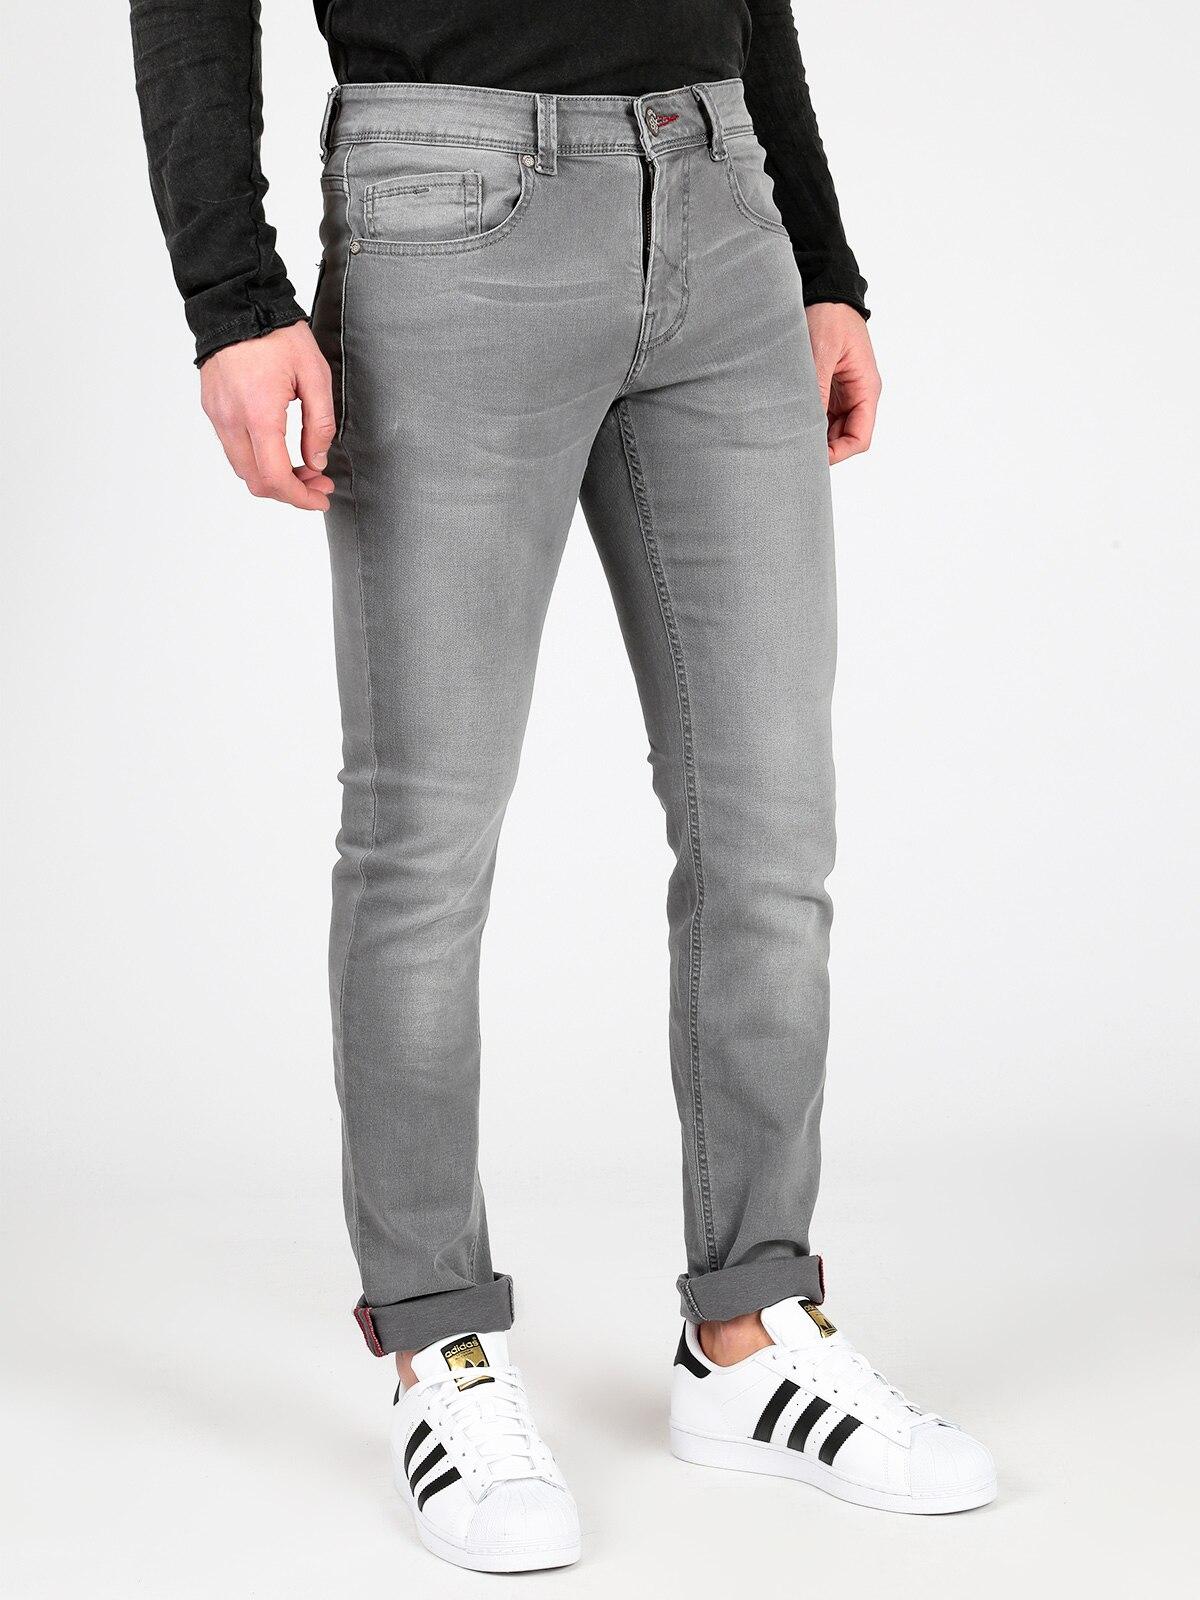 Gray Jeans Pattern 5 Pockets